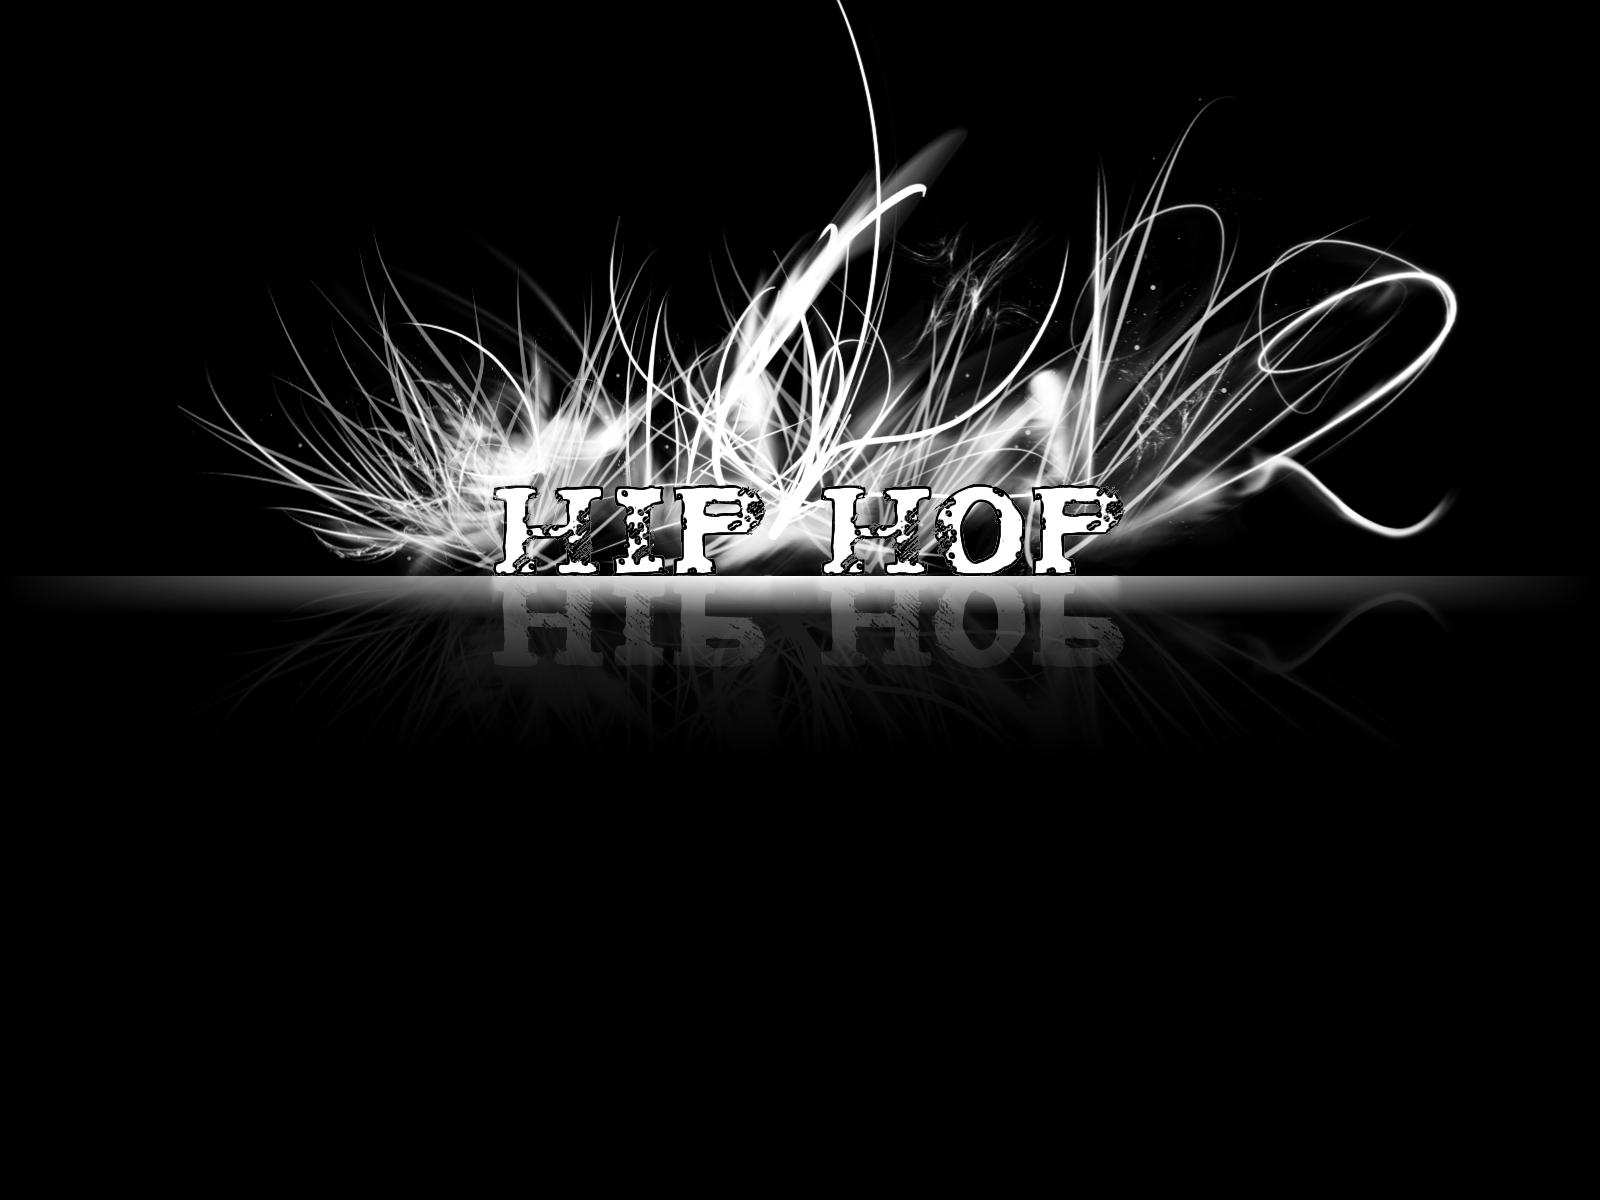 http://4.bp.blogspot.com/_bHbQm-RNcB8/TQgcwNuulMI/AAAAAAAACvs/F26-473Tspg/s1600/img-wallpapers-hip-hop-clubadmin-12348.jpg